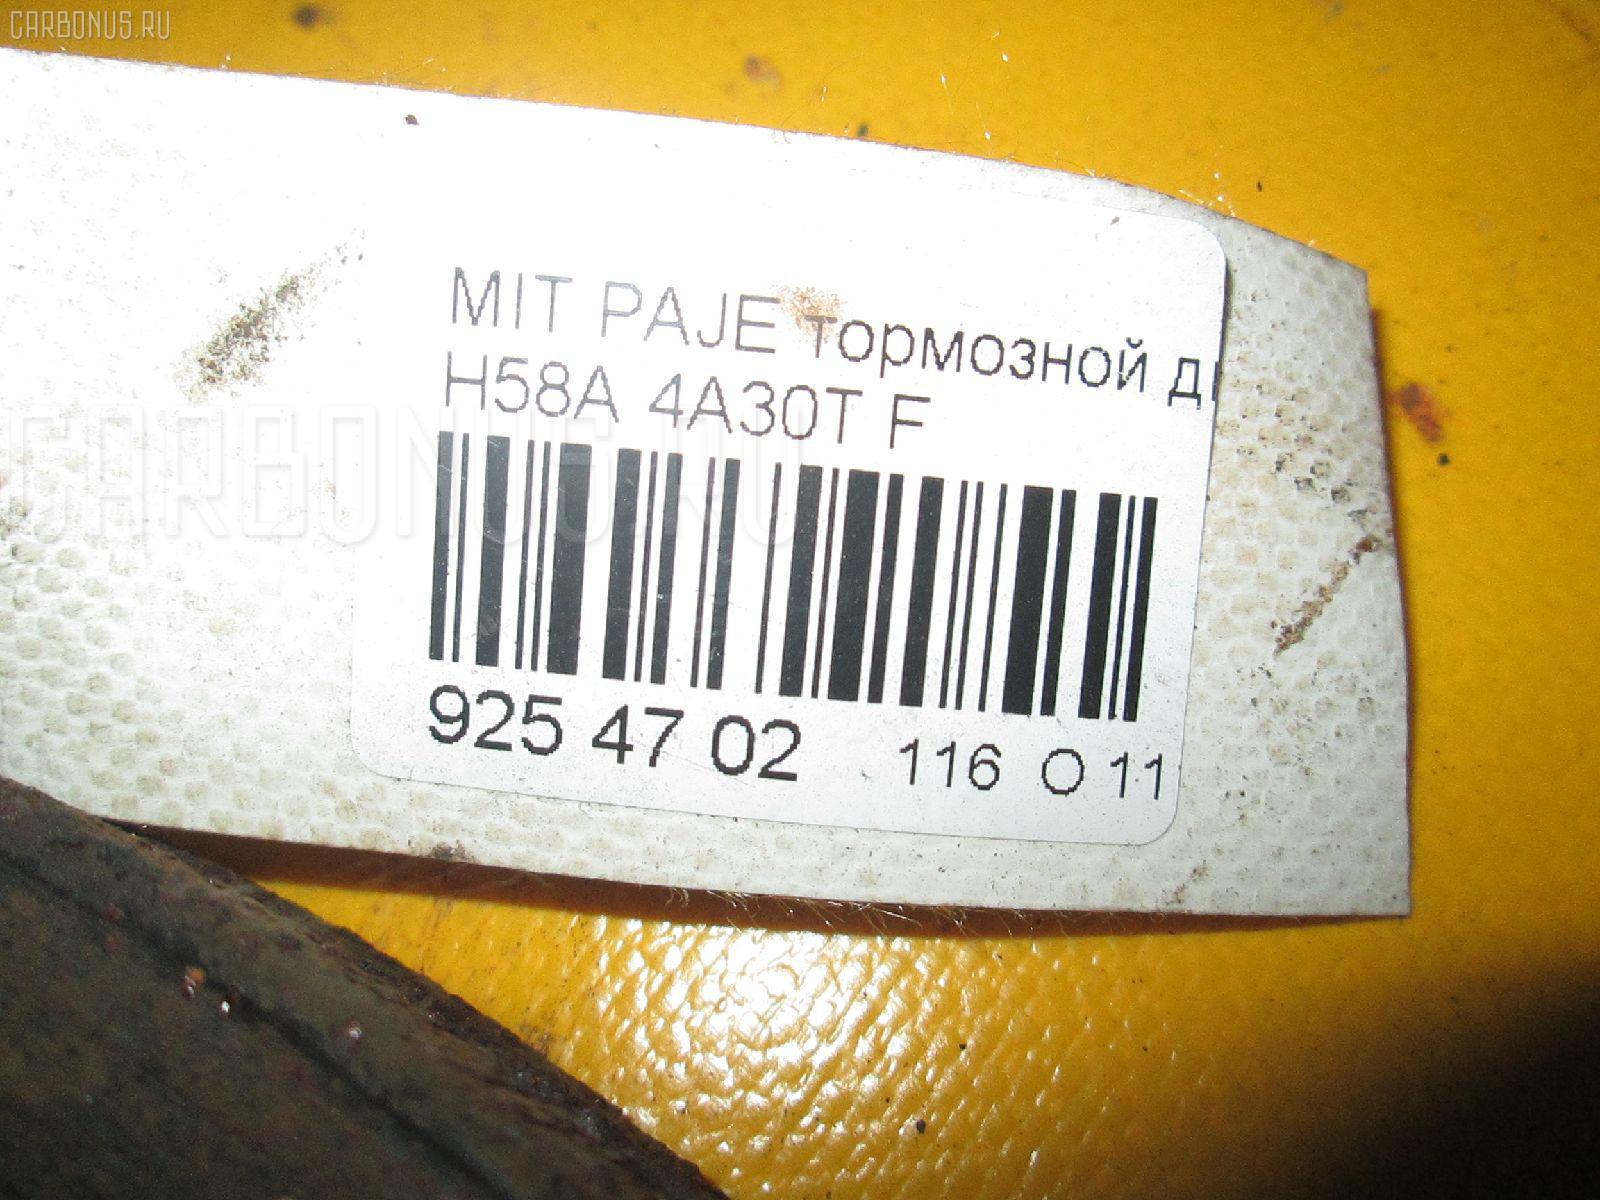 Тормозной диск MITSUBISHI PAJERO MINI H58A 4A30T Фото 2